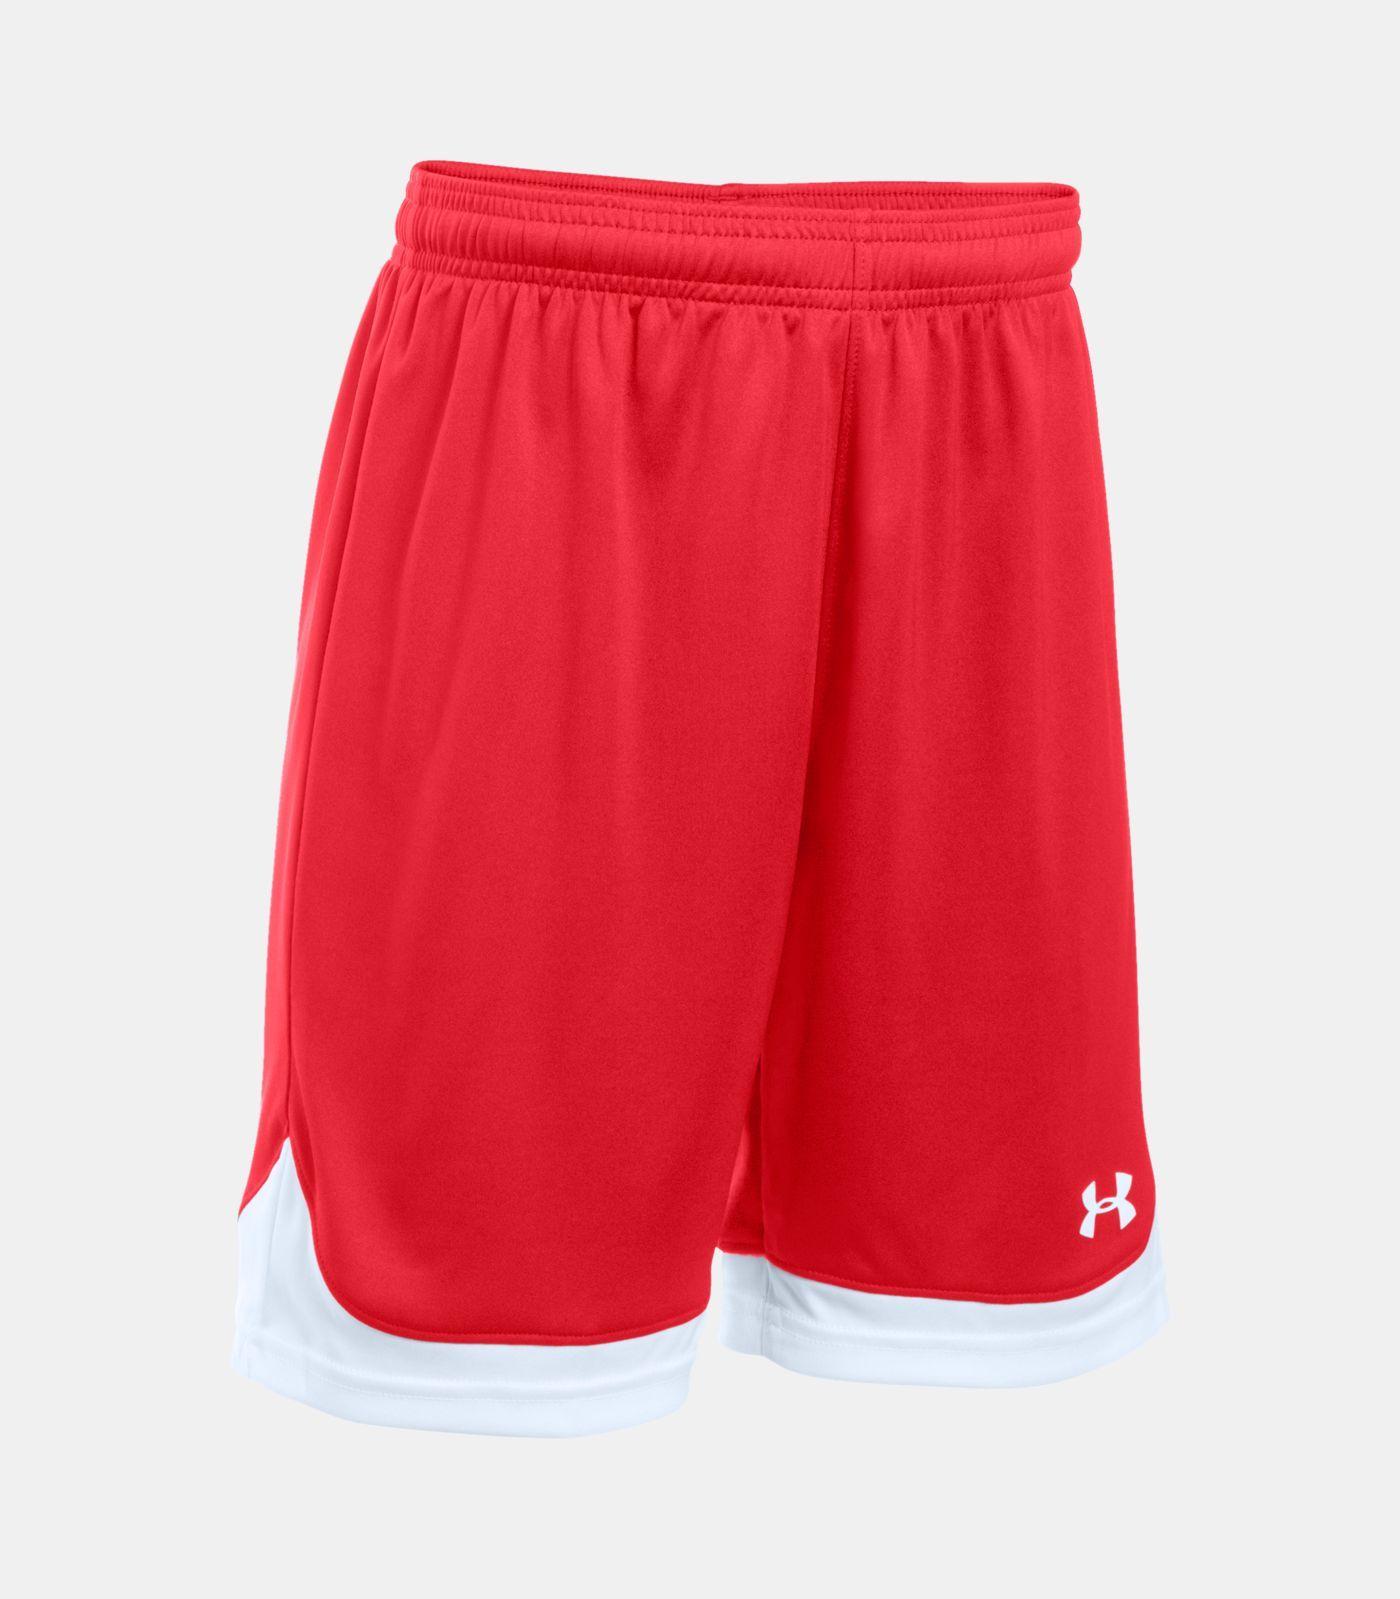 5910e2e6d Under Armour Boys' UA Maquina Shorts   Declan   Pinterest   Soccer ...